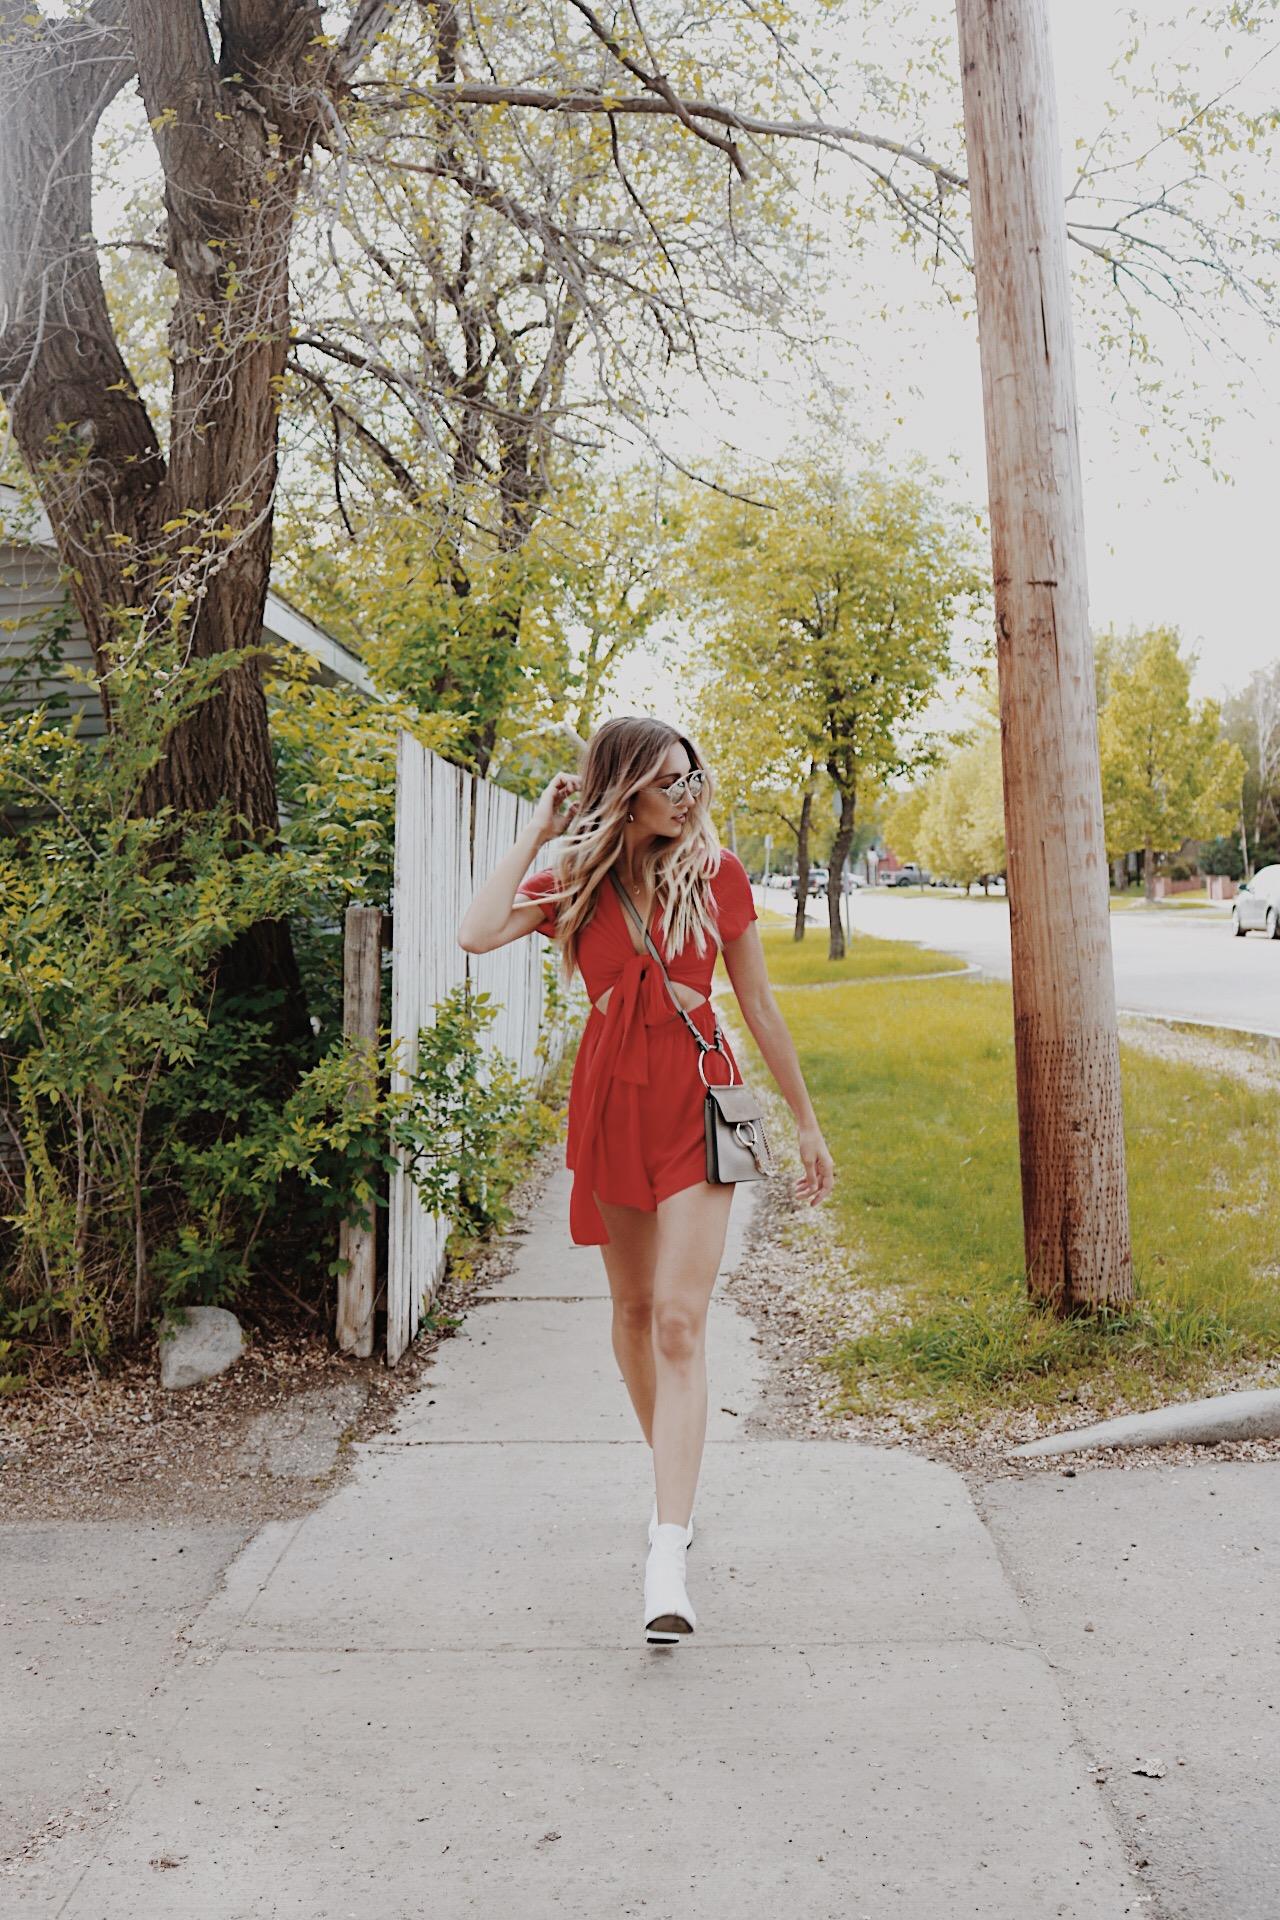 princess polly jumper romper playsuit red tie ootd summer chloe faye brittanylaurens brittany lauren canada fashion blogger inspo